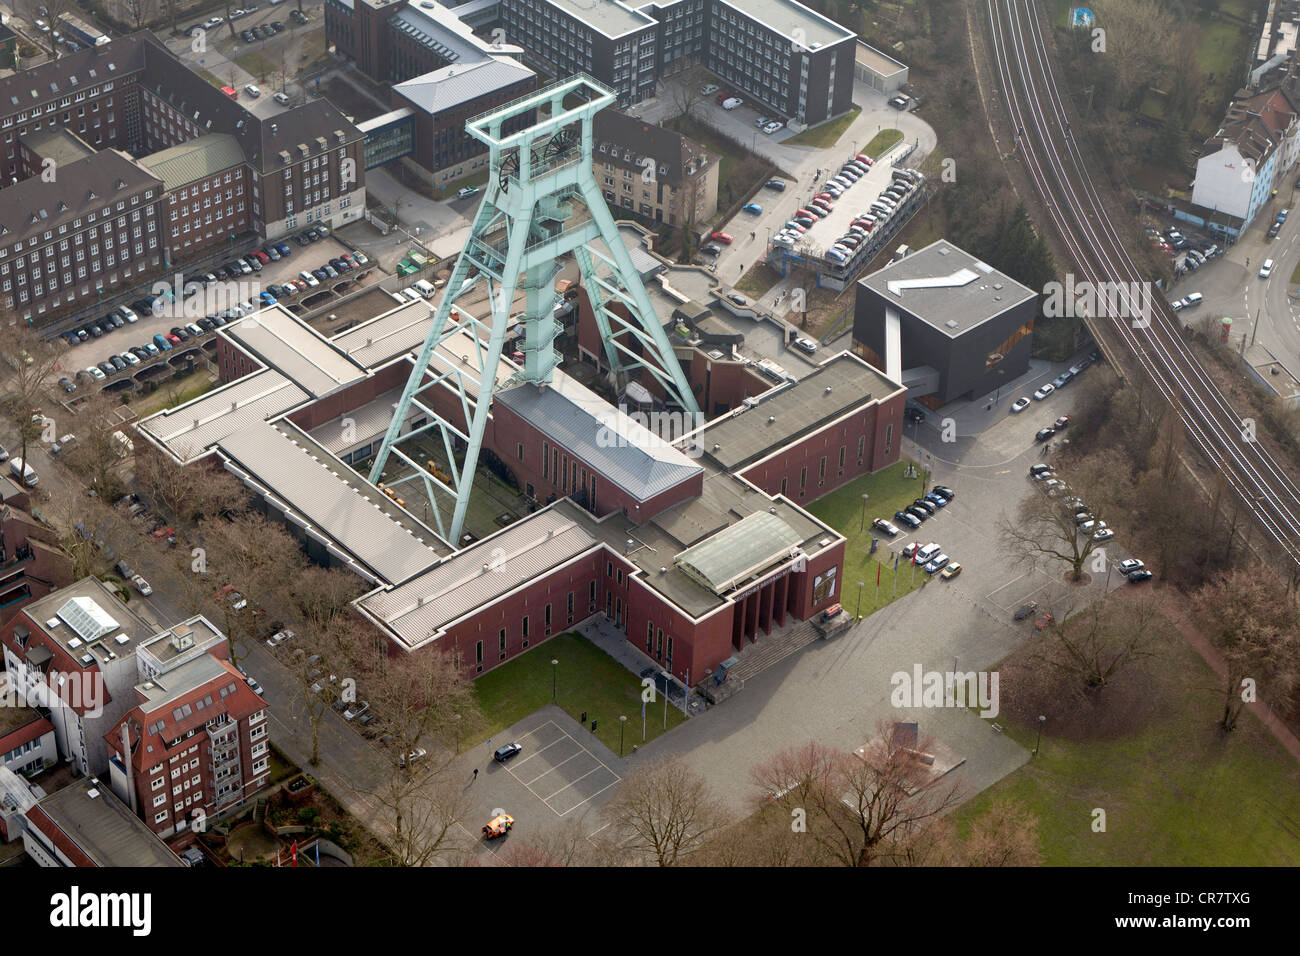 Aerial view, Bergbaumuseum mining museum, DMT-Gesellschaft fuer Lehre und Bildung mbH for teaching and education, - Stock Image